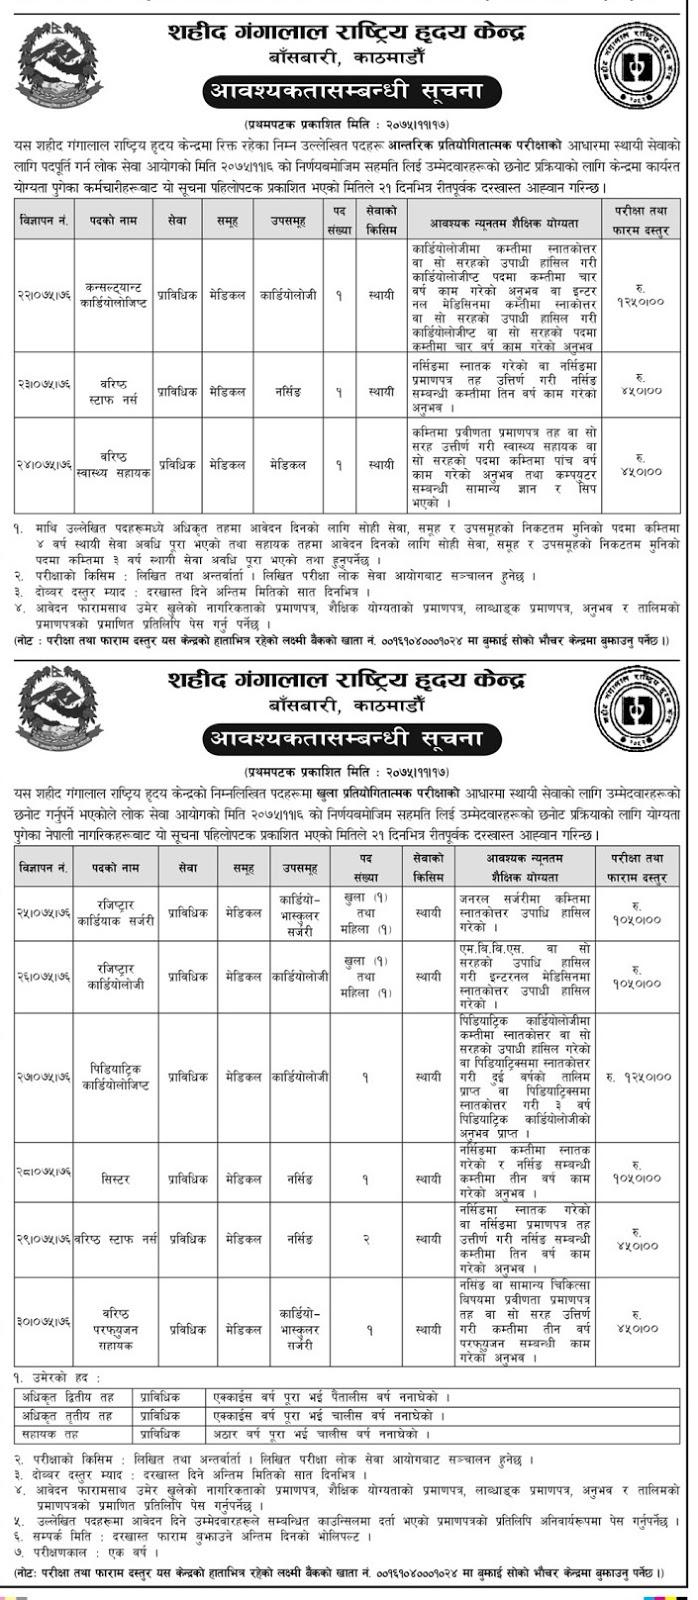 Shahid Gangalal Rastriya Hriday Kendra Announced Various Post Vacancies